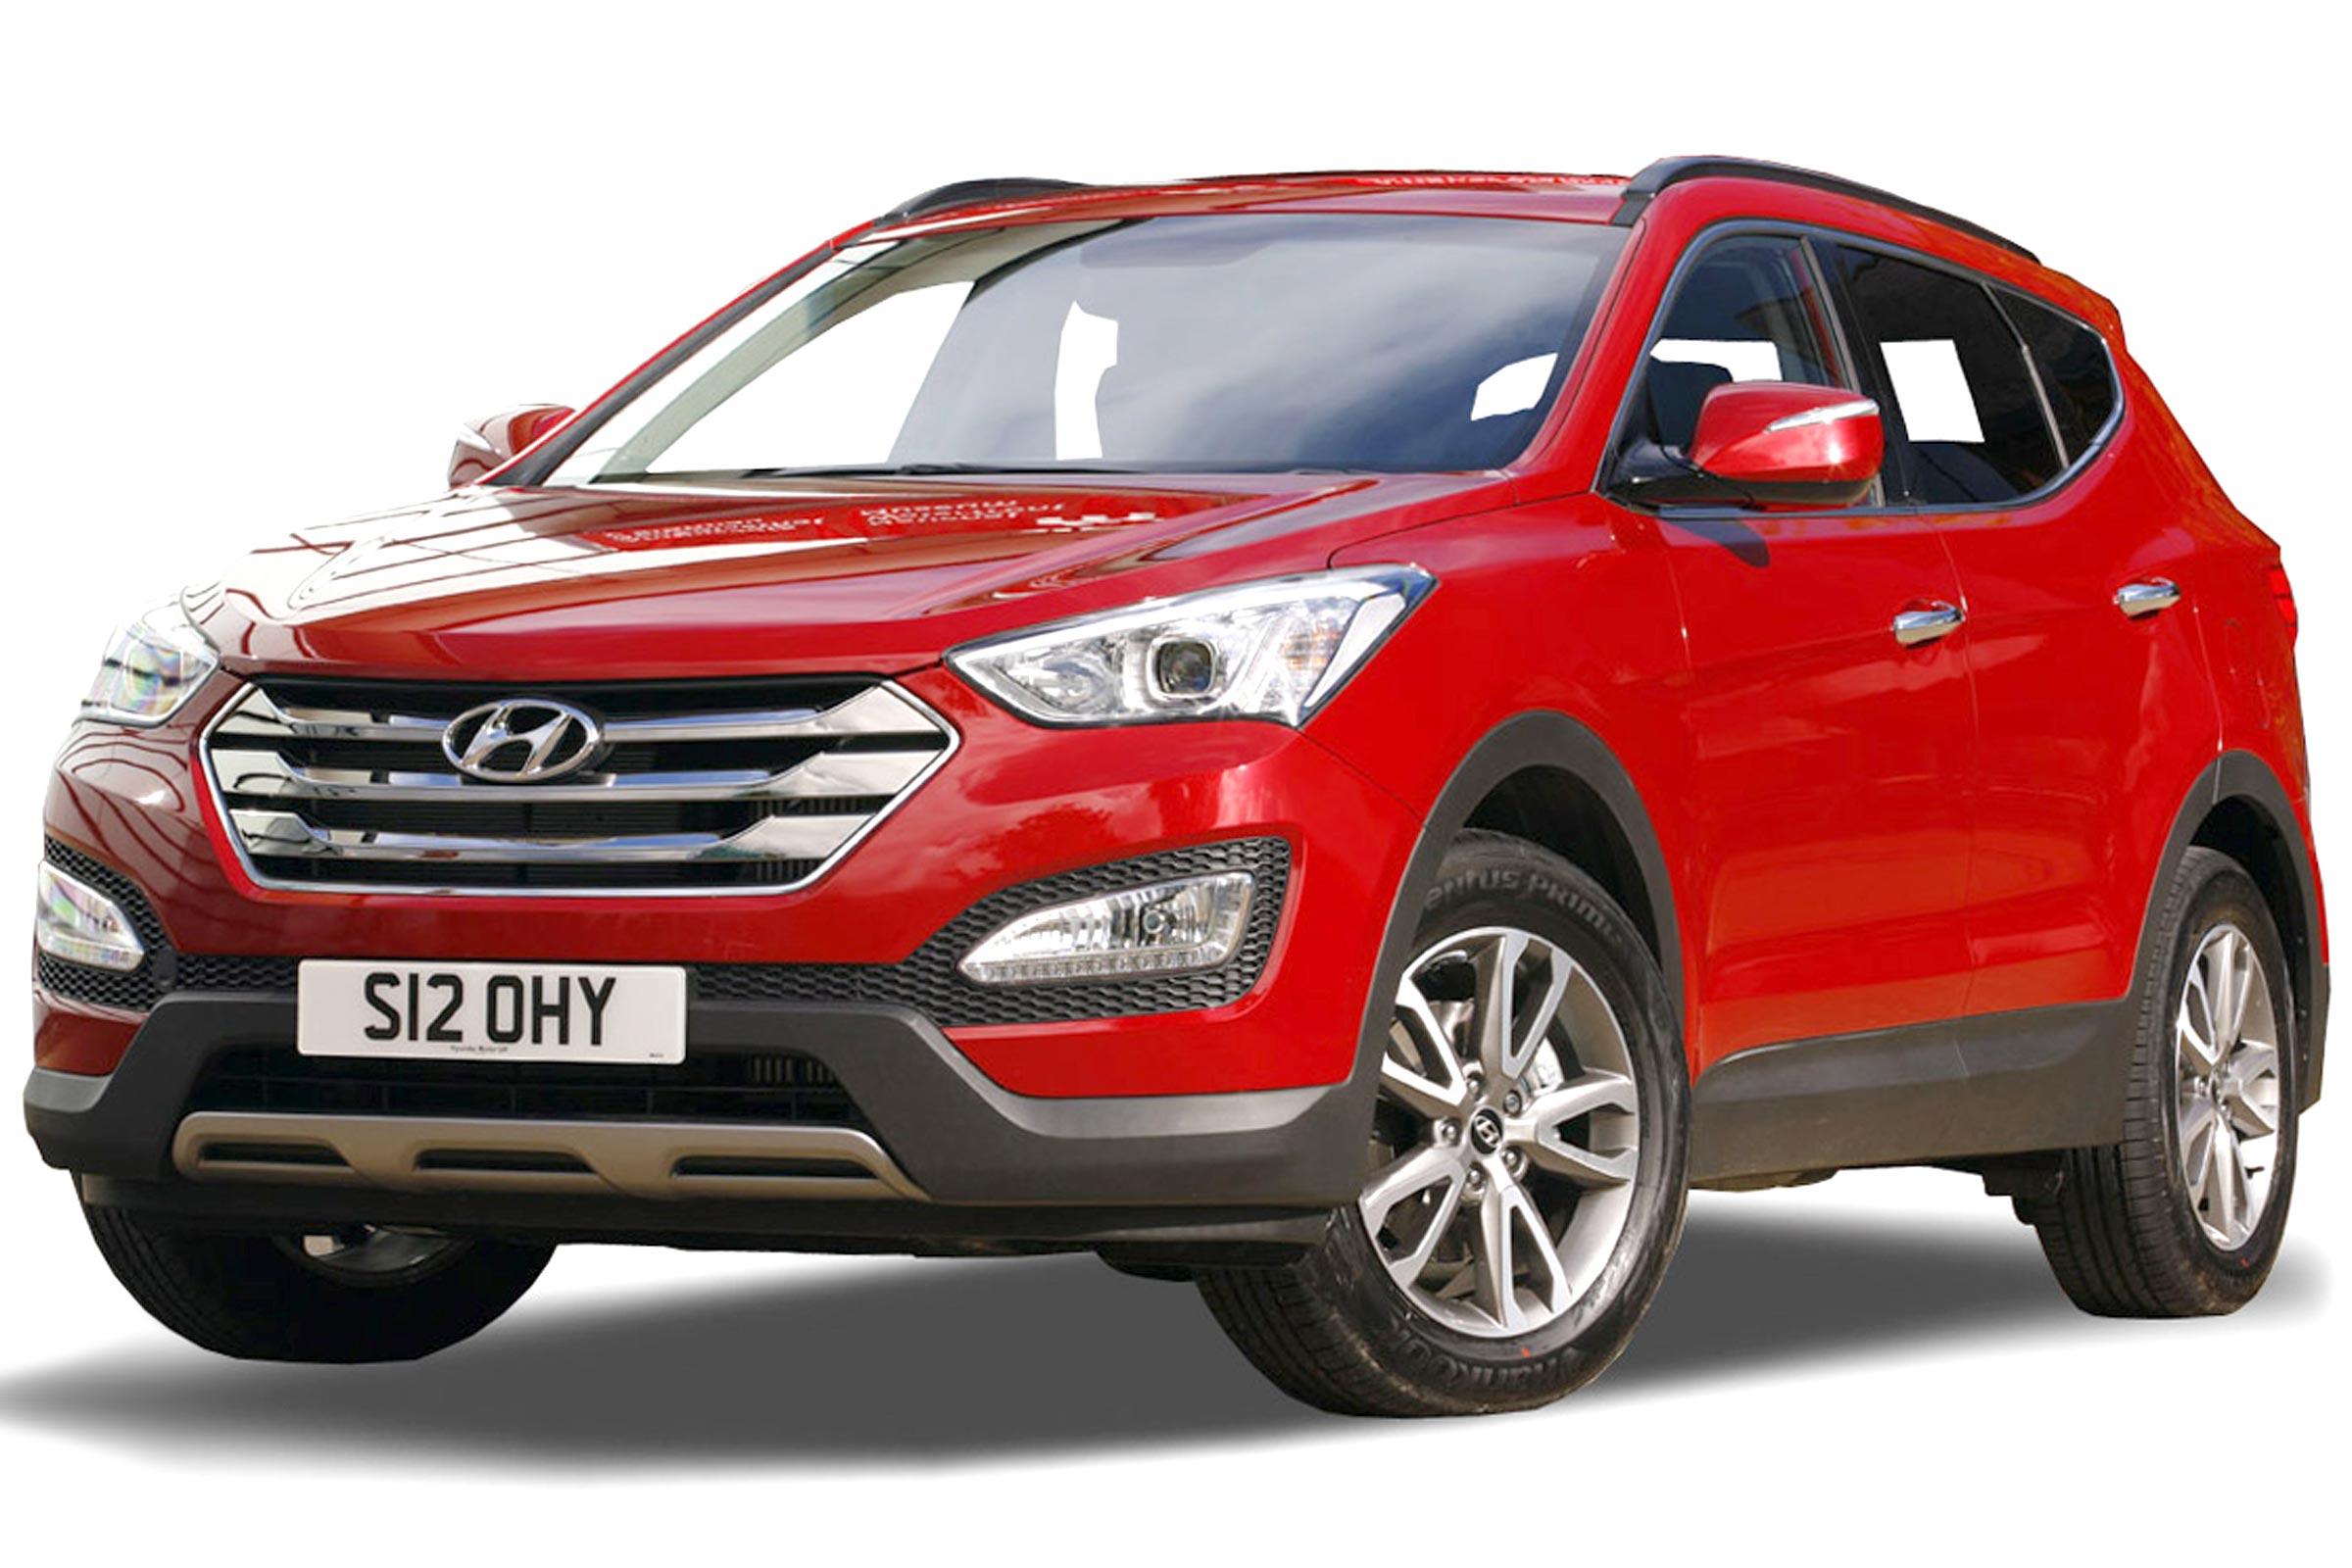 Hyundai Santa Fe 2013 2018 Owner Reviews Mpg Problems Reliability Carbuyer